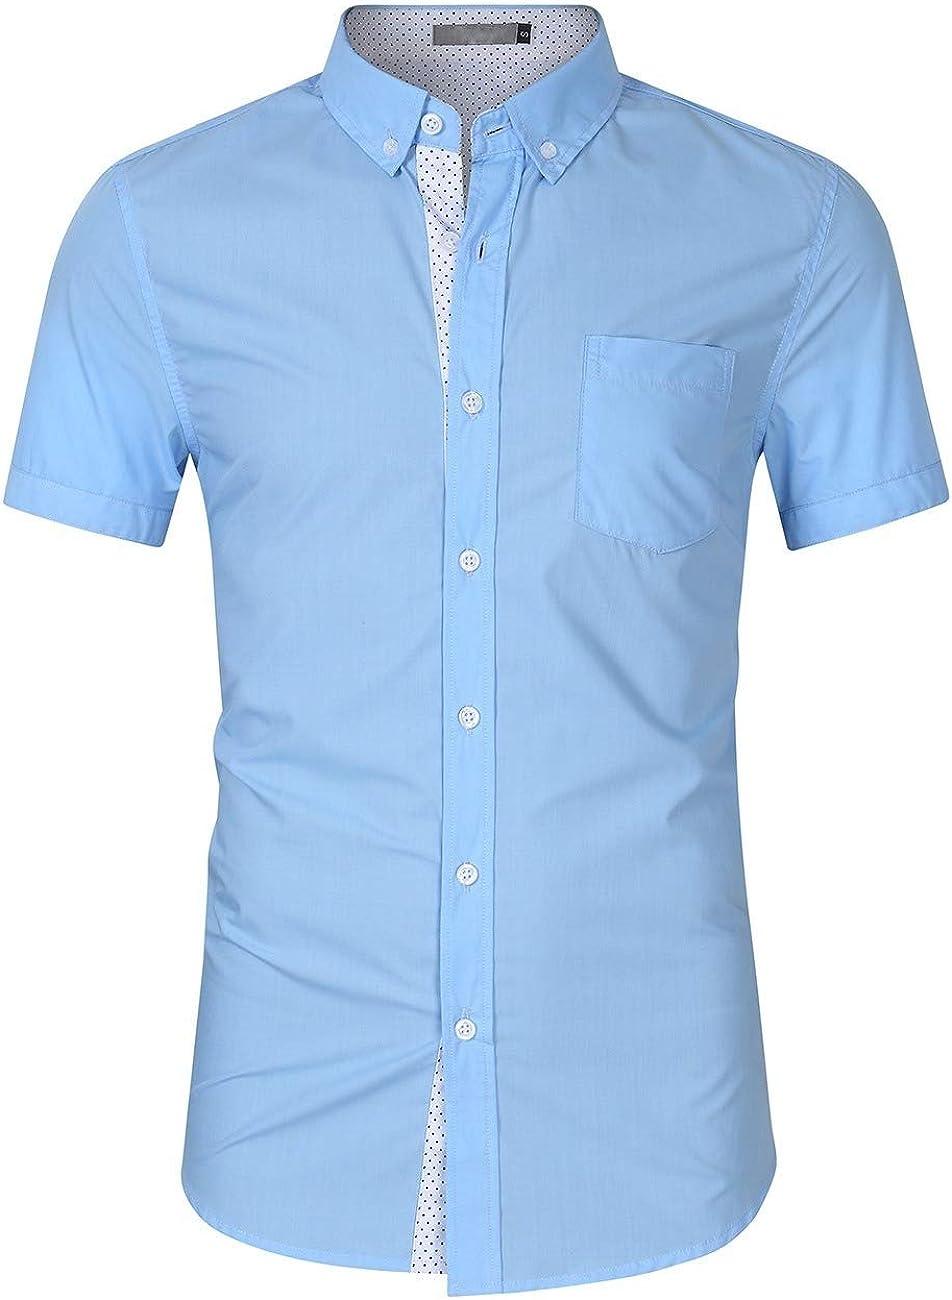 Vska Men Short-Sleeve Lounge Printing Lapel Button Oversized Tees Polo Shirt